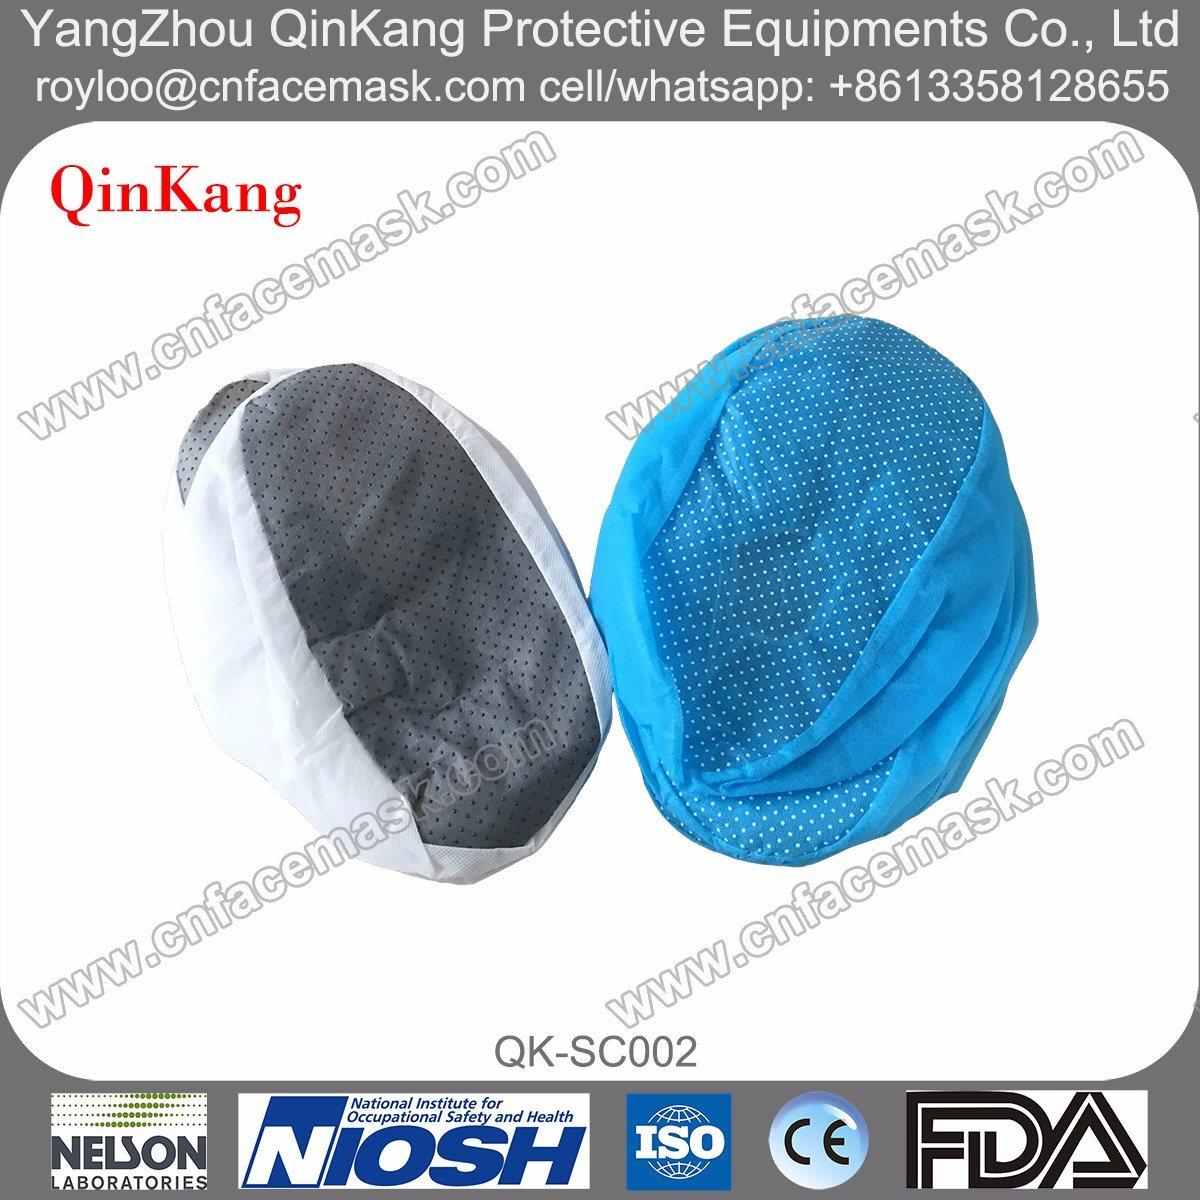 PP Spunbond Nonwoven Anti-Skid Shoe Cover